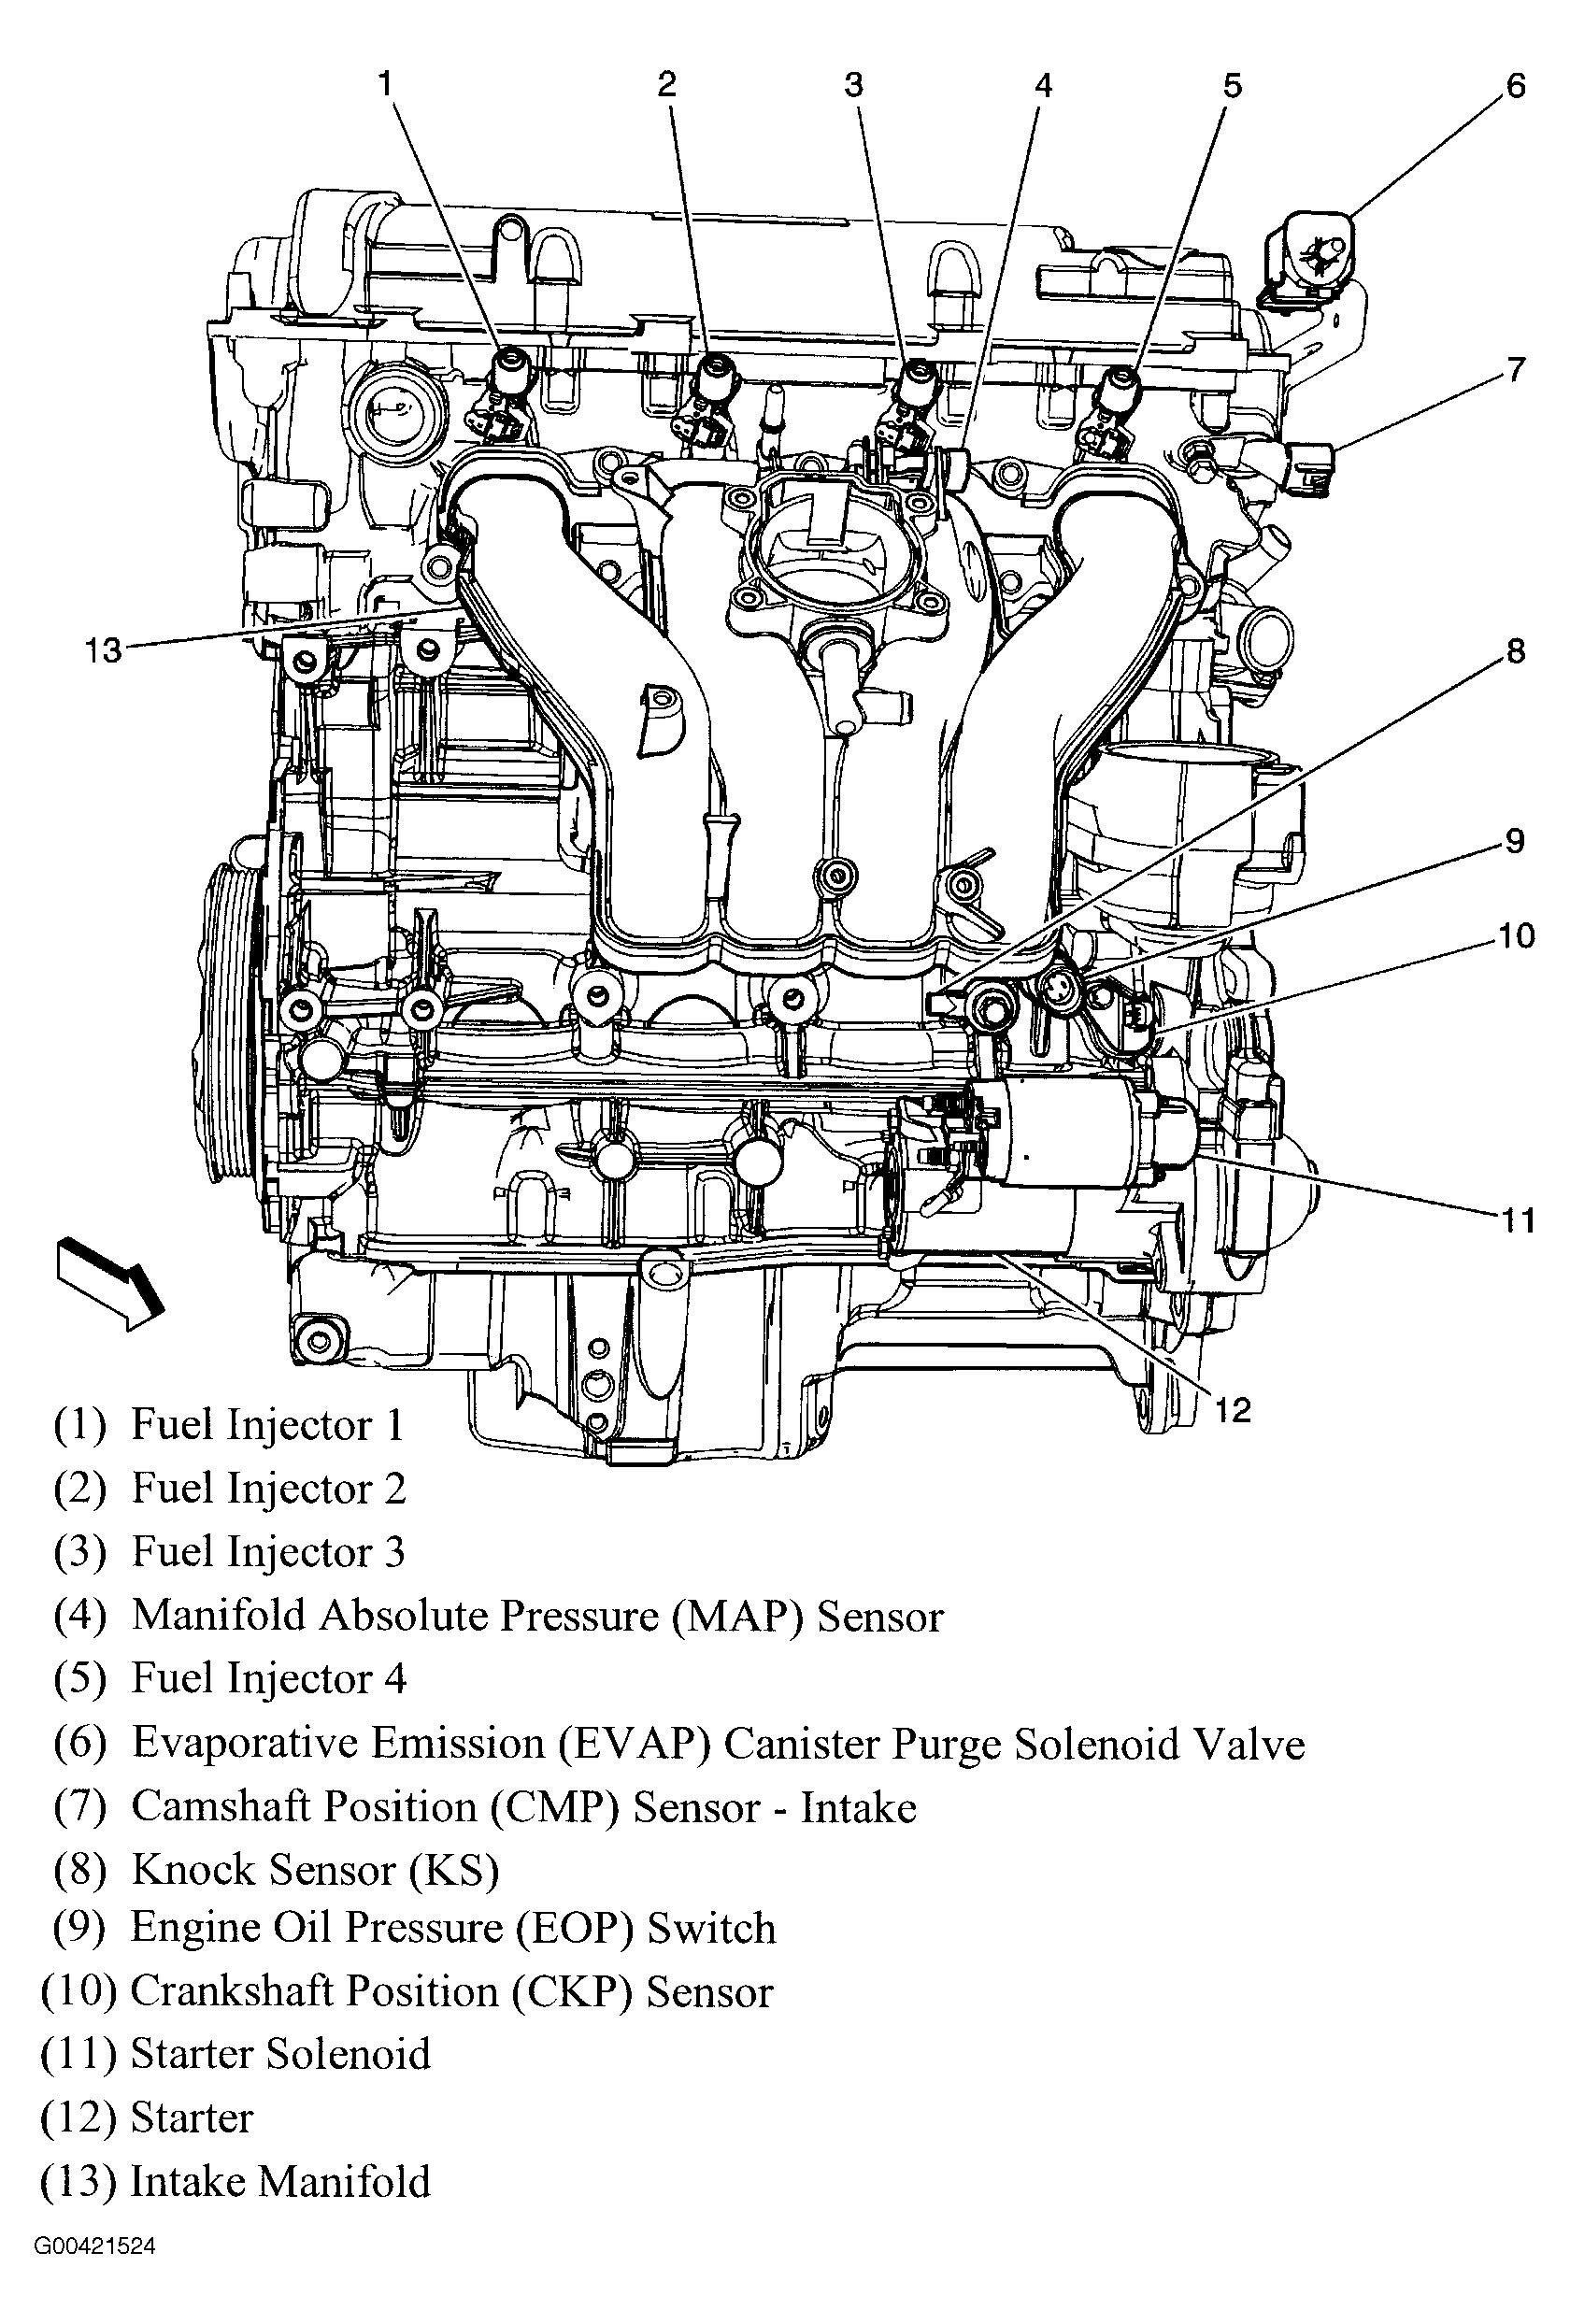 Pontiac Grand Am Engine Diagram Pontiac 2 4 Engine Diagram Intake Manifold Wiring Diagram Dash Of Pontiac Grand Am Engine Diagram